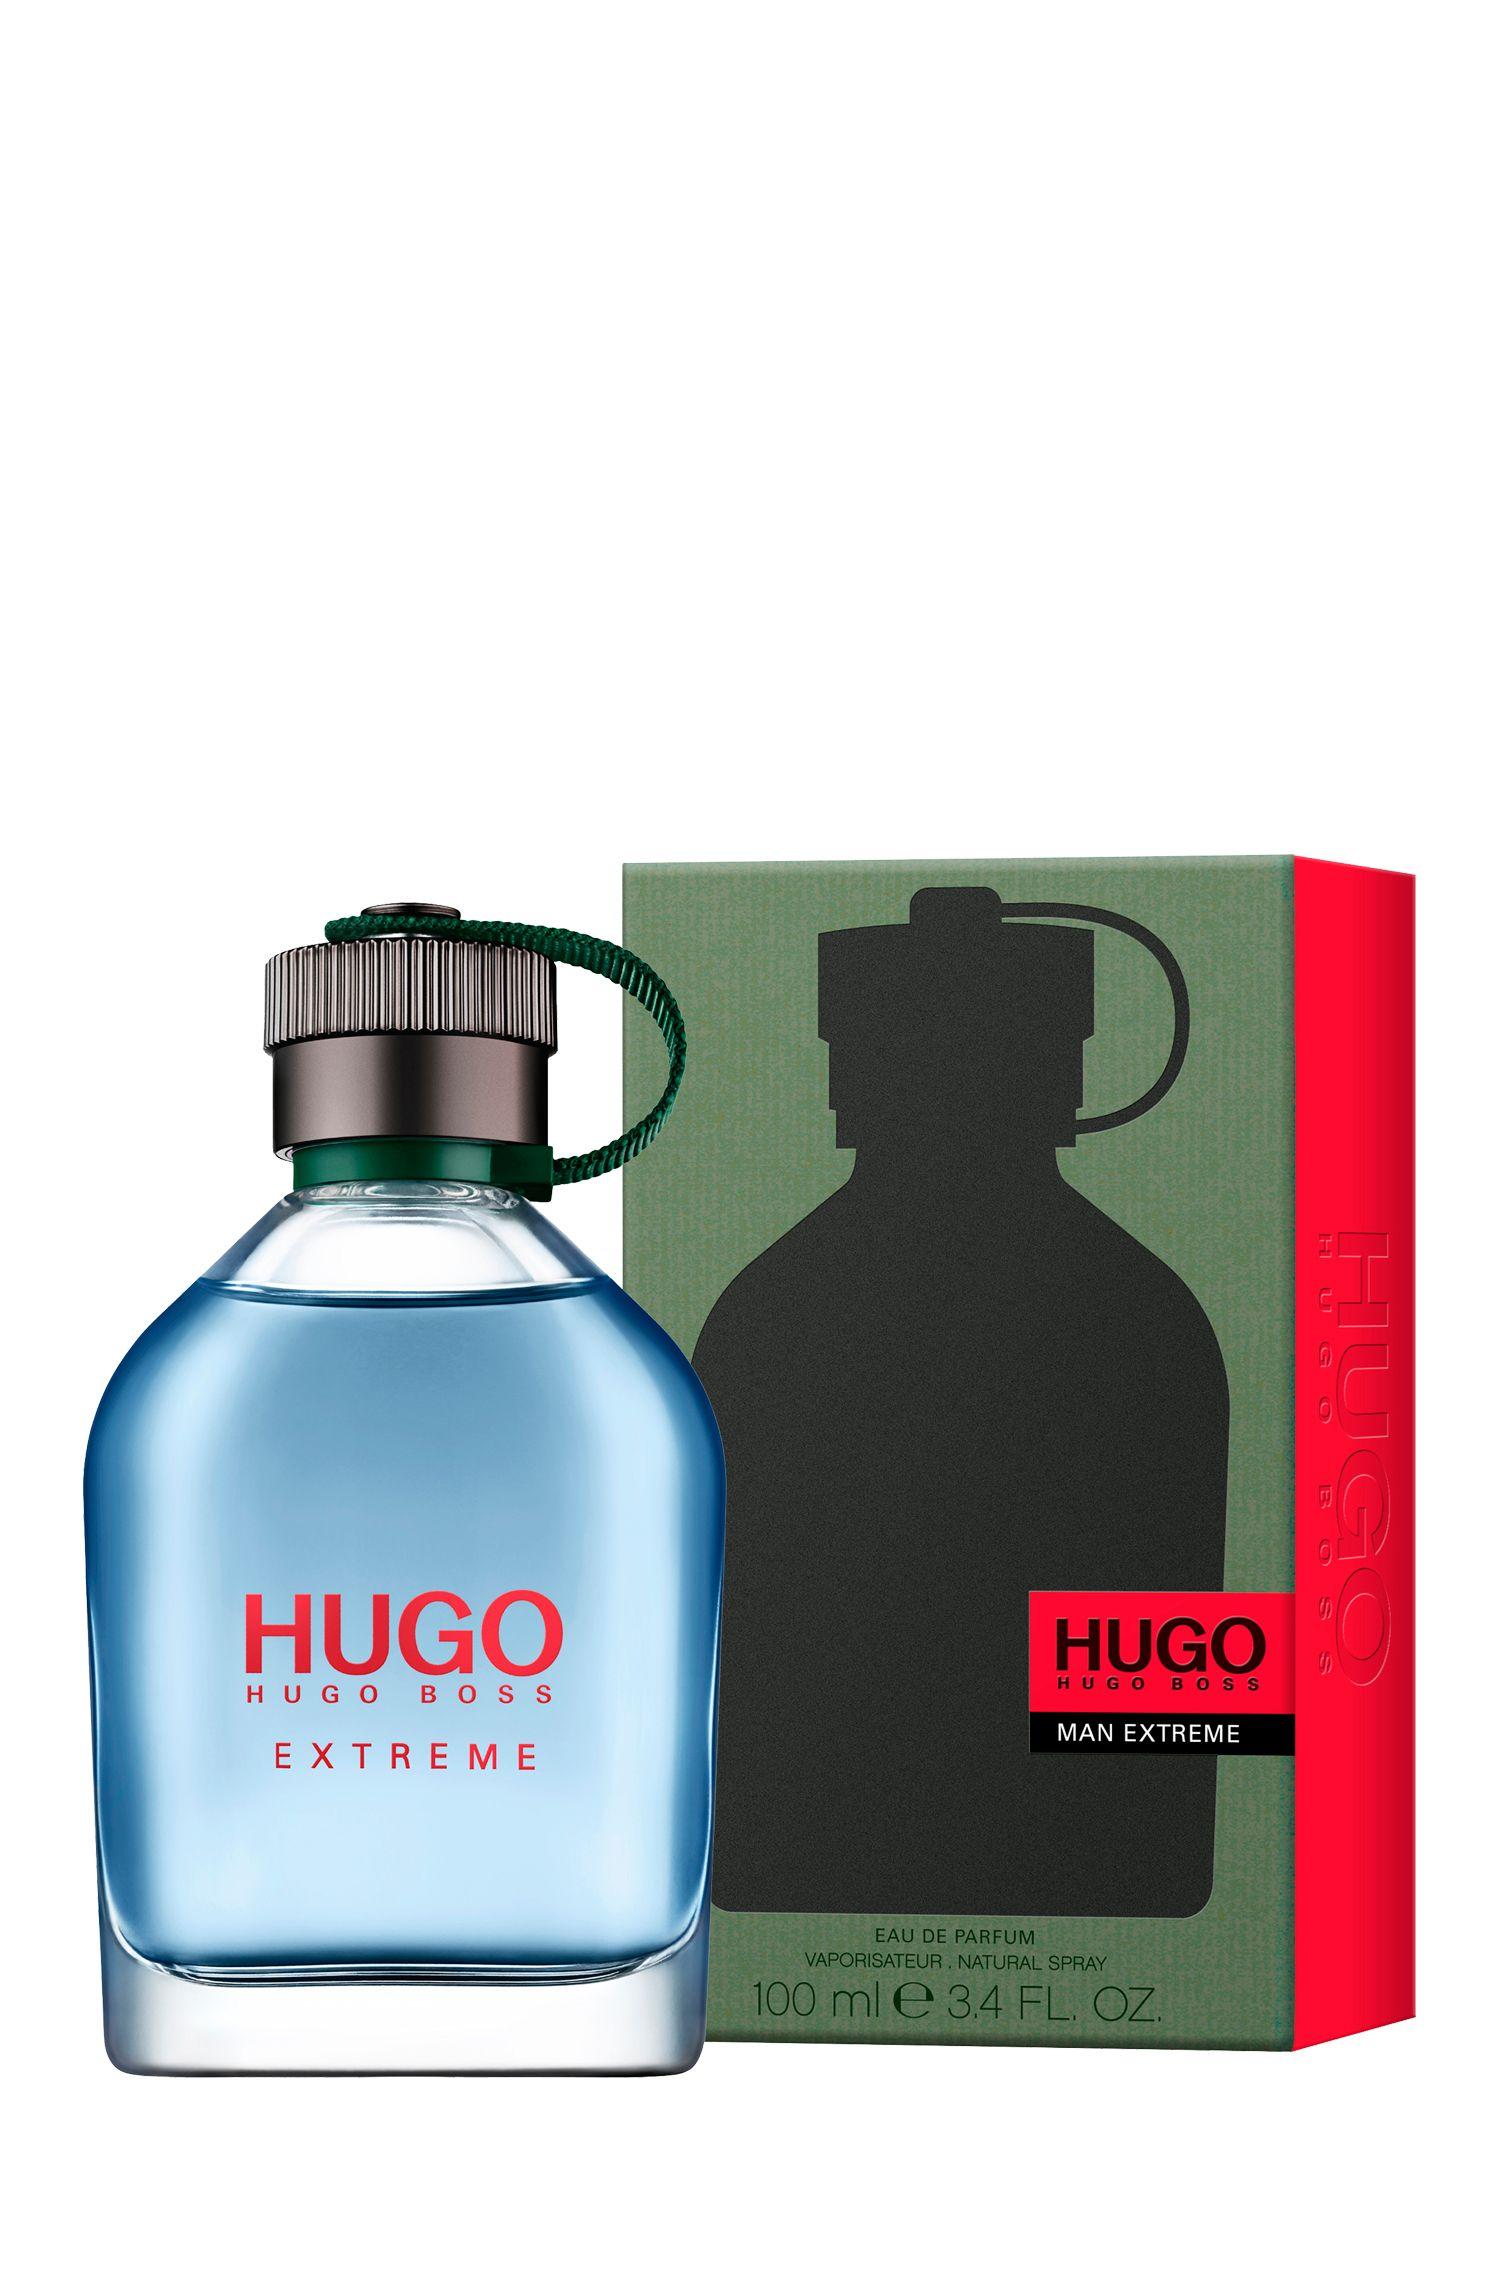 'HUGO MAN EXTREME ' | 3.4 fl. oz. (100 mL) Eau de Parfume